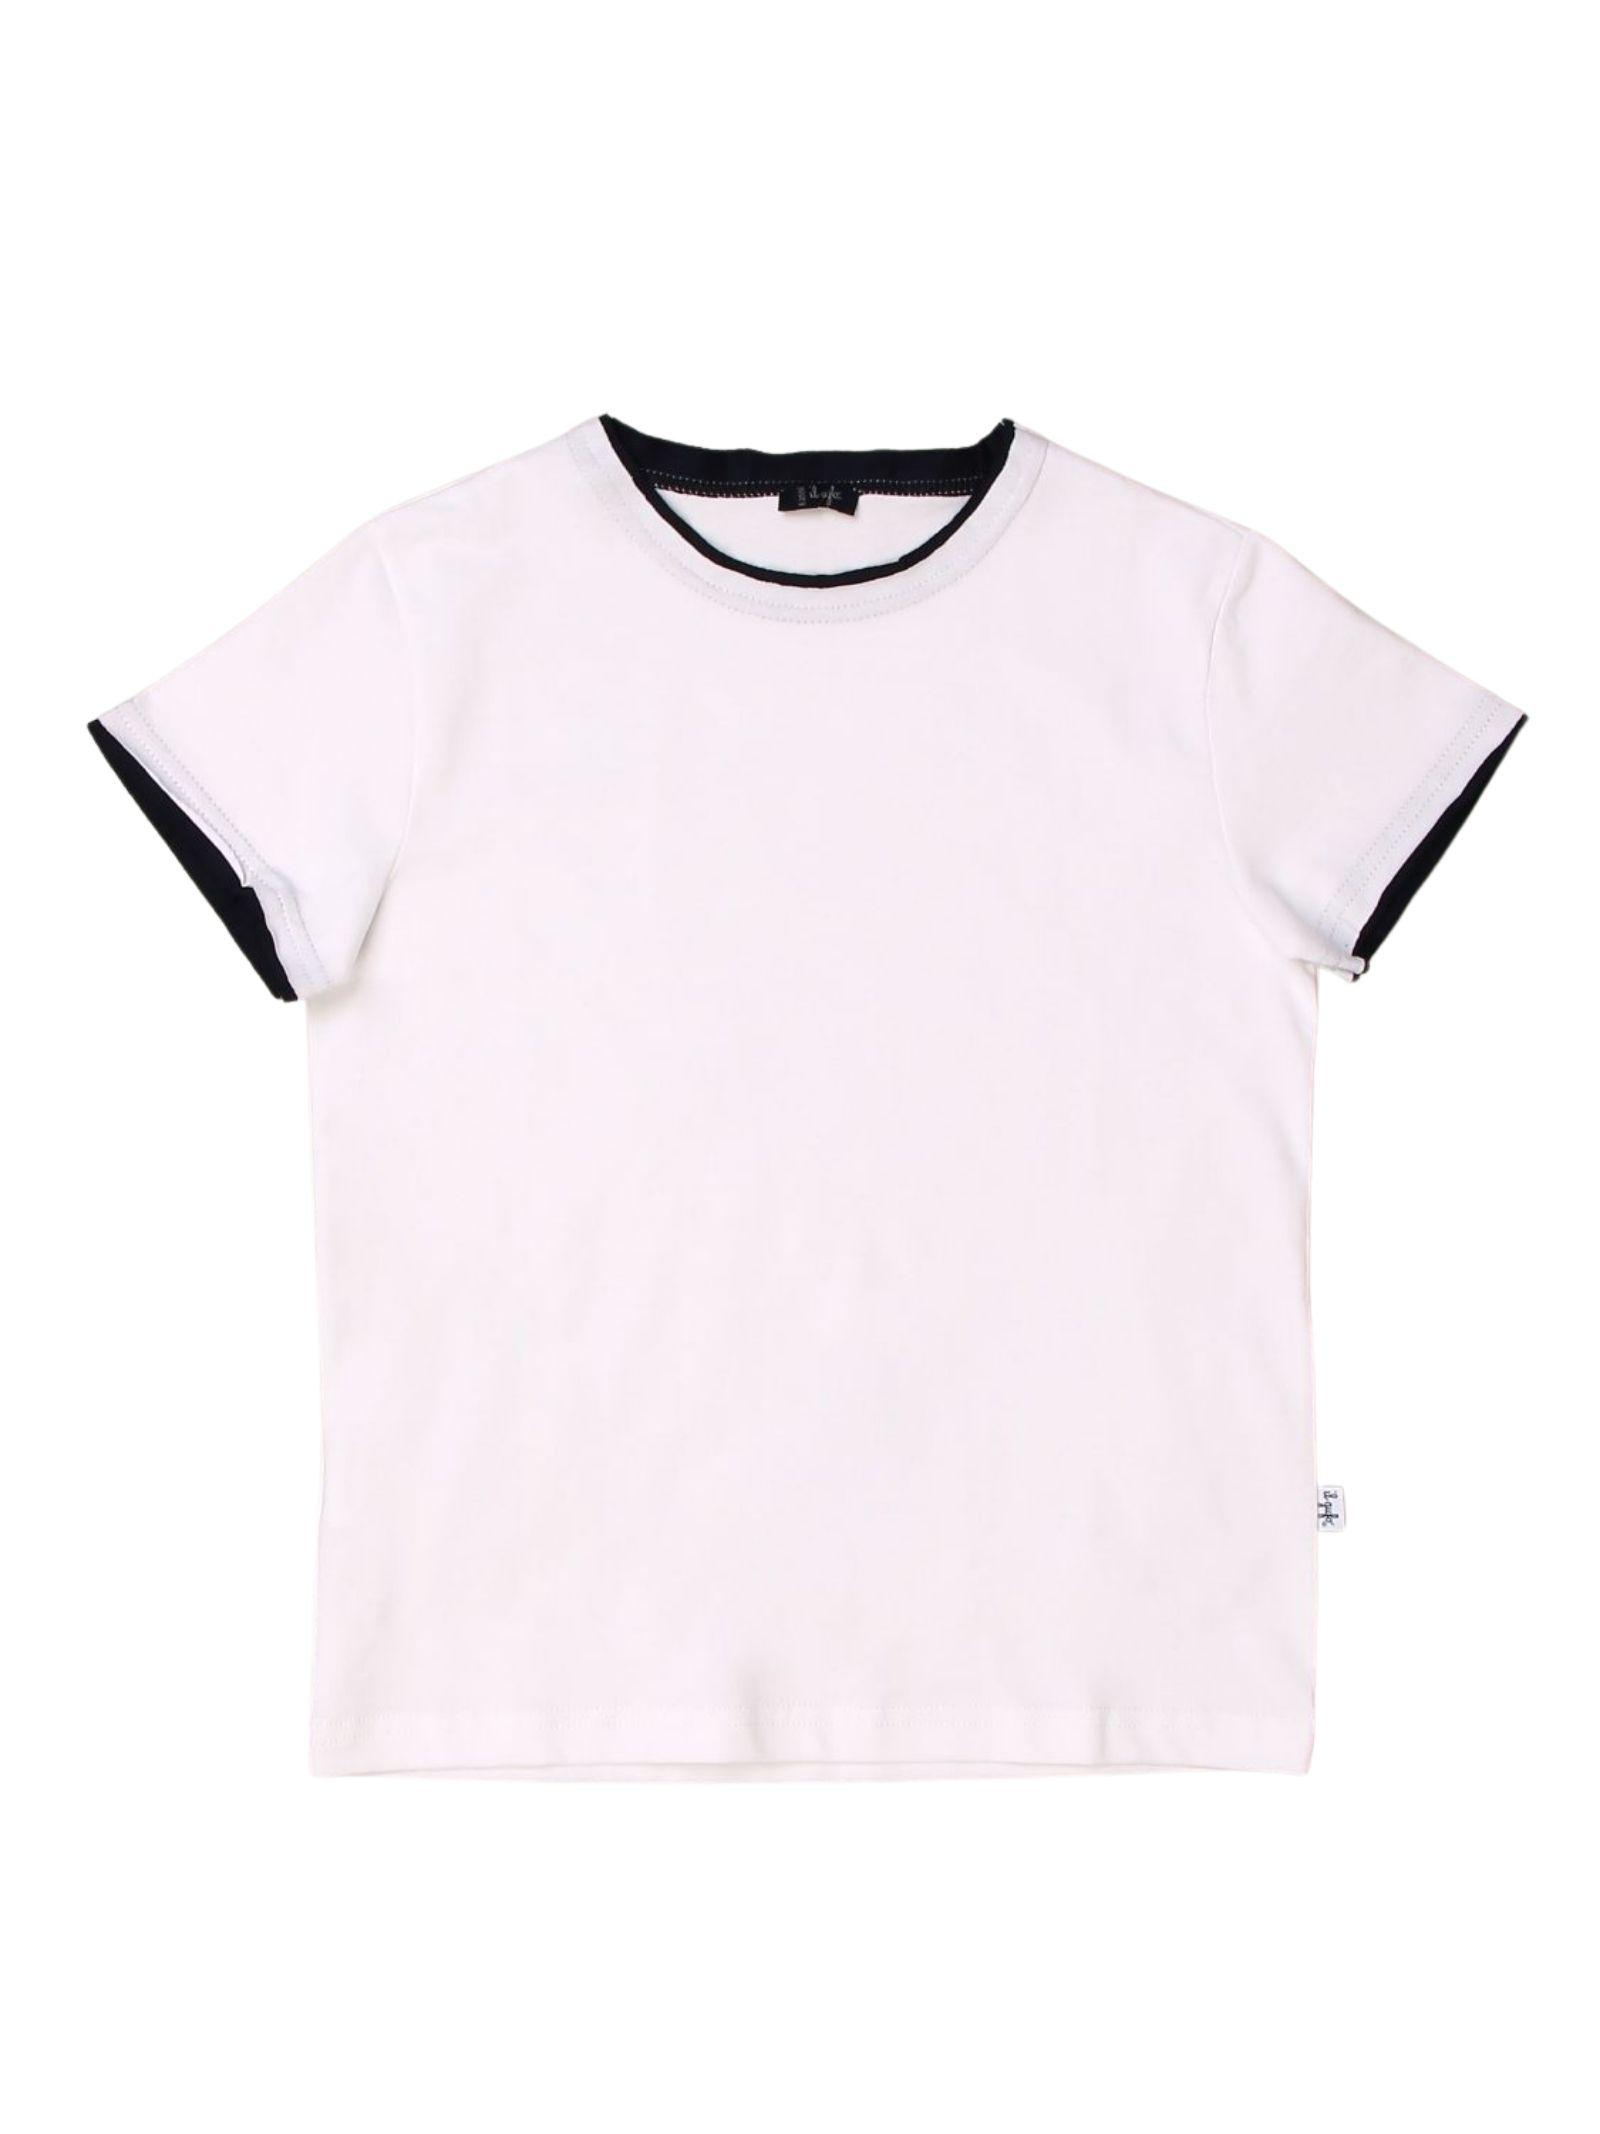 IL GUFO | T-shirt | CP21TS050M00320149